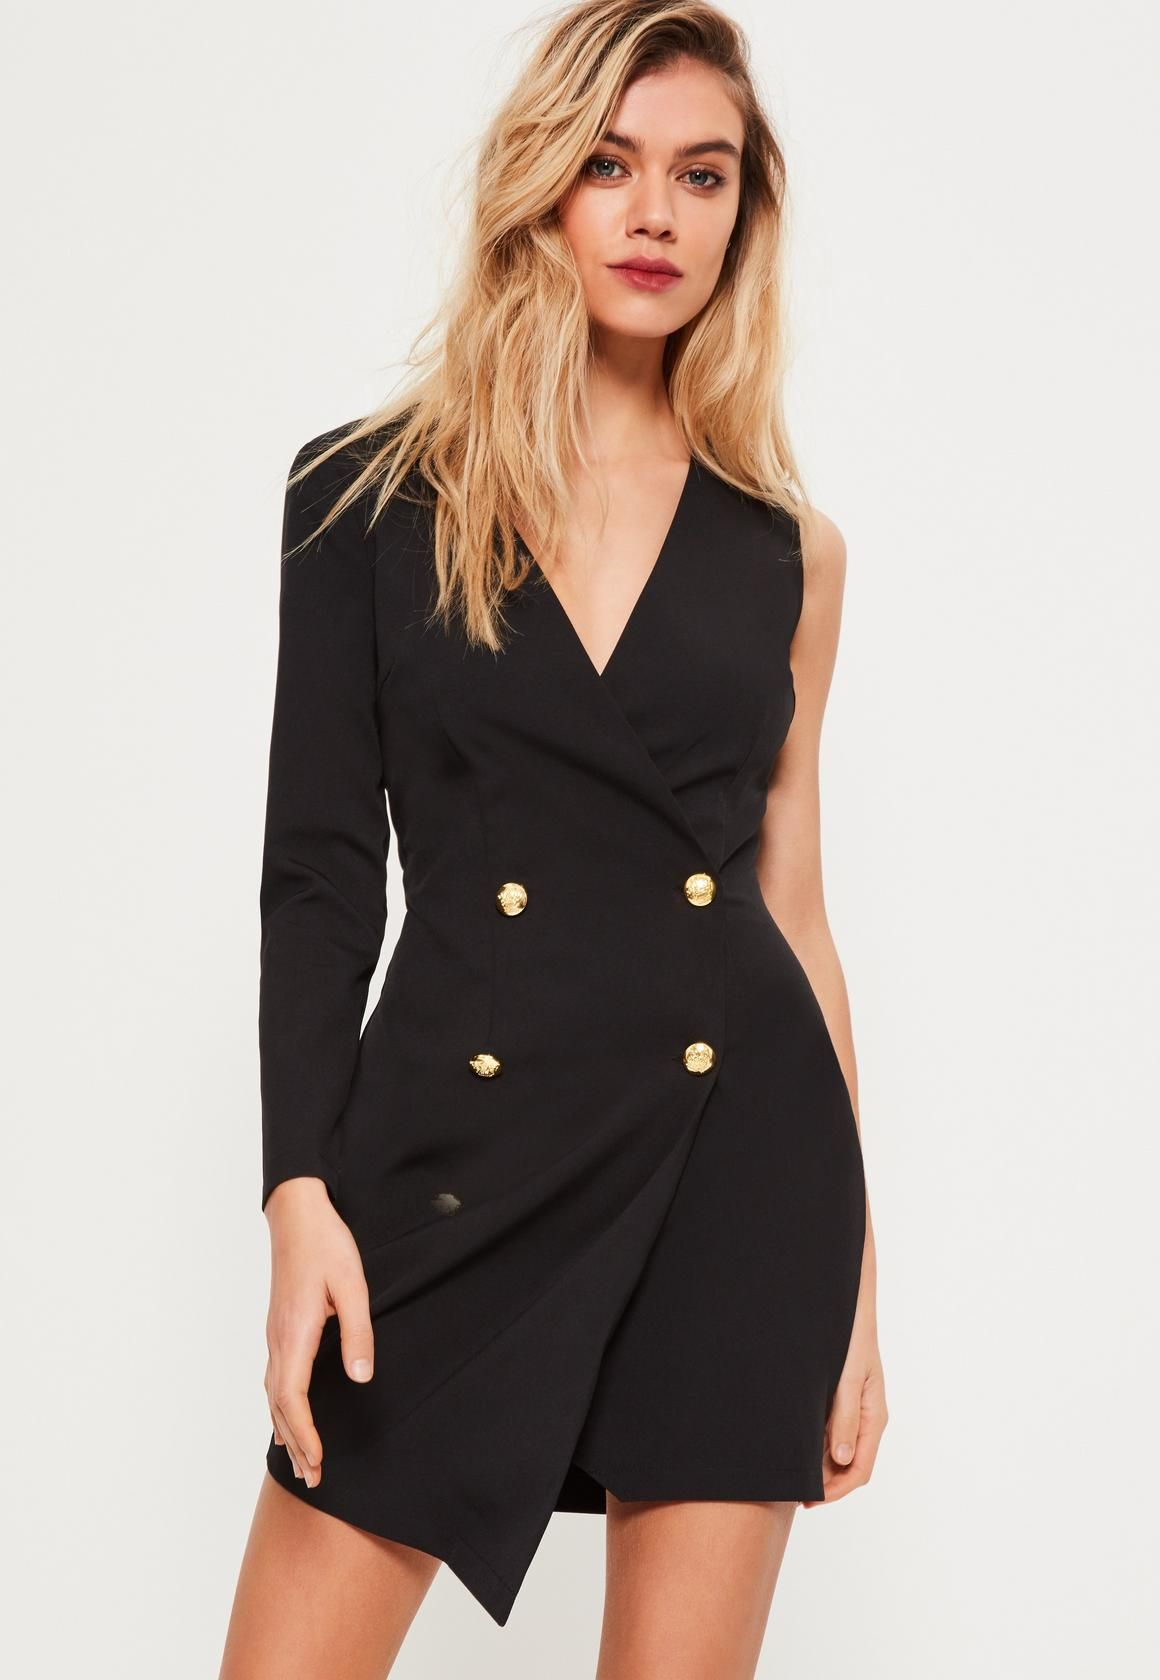 Missguided - Petite Black One Sleeve Tuxedo Dress  c32492d26